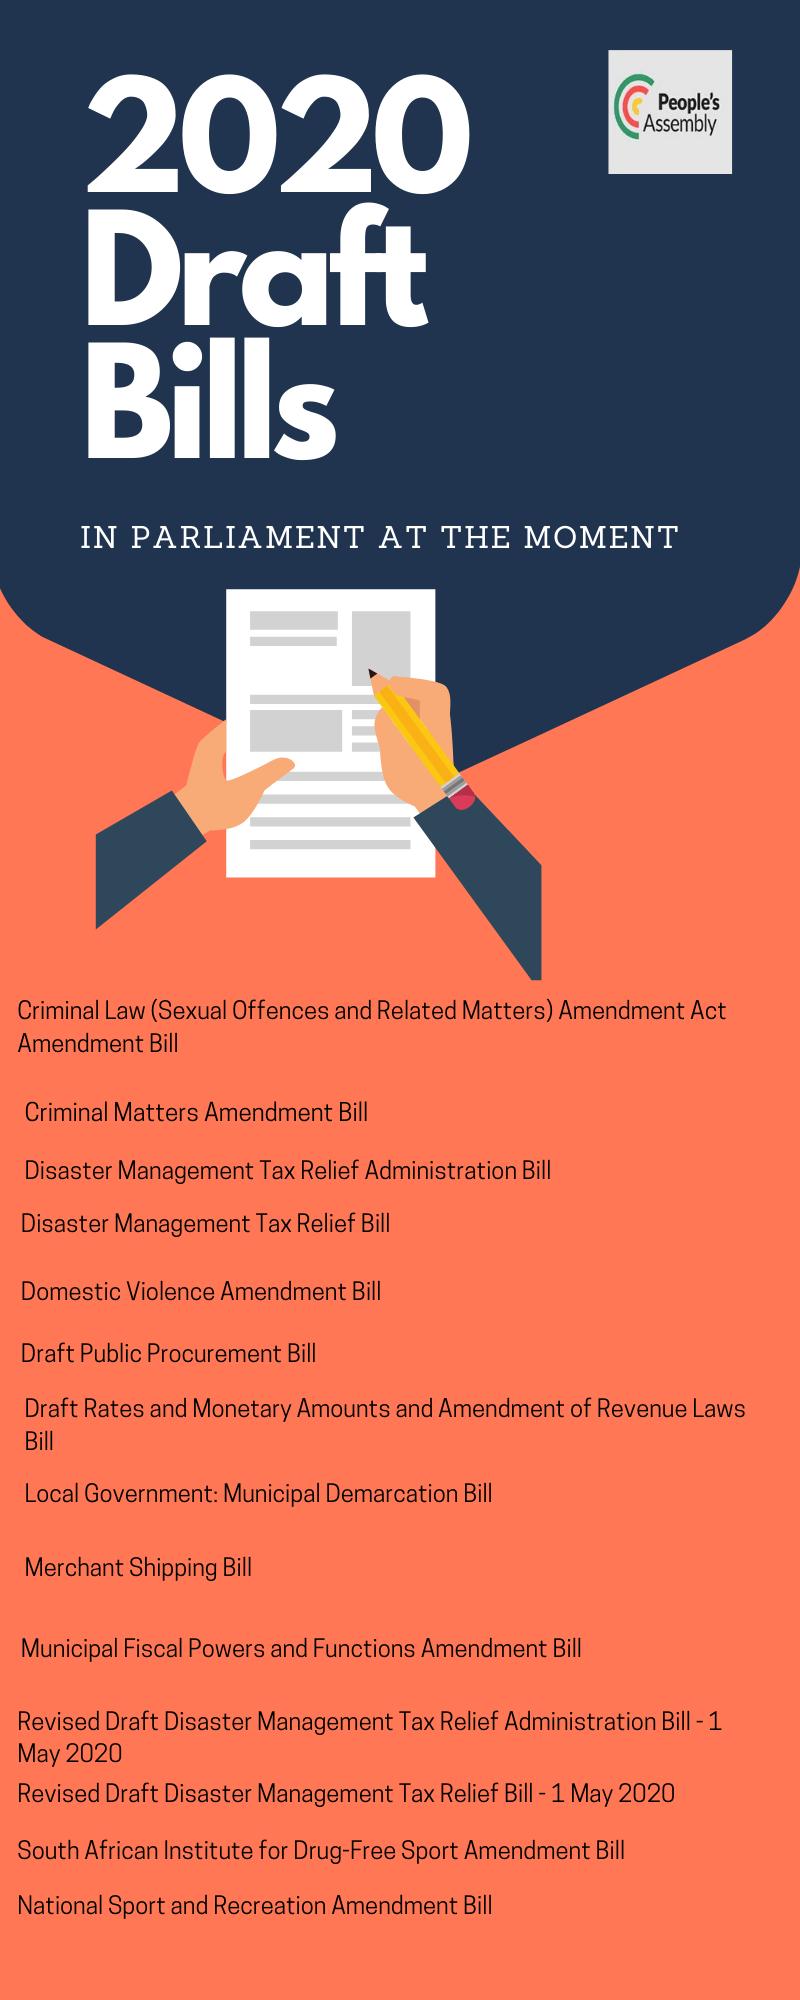 Draft bills 2020